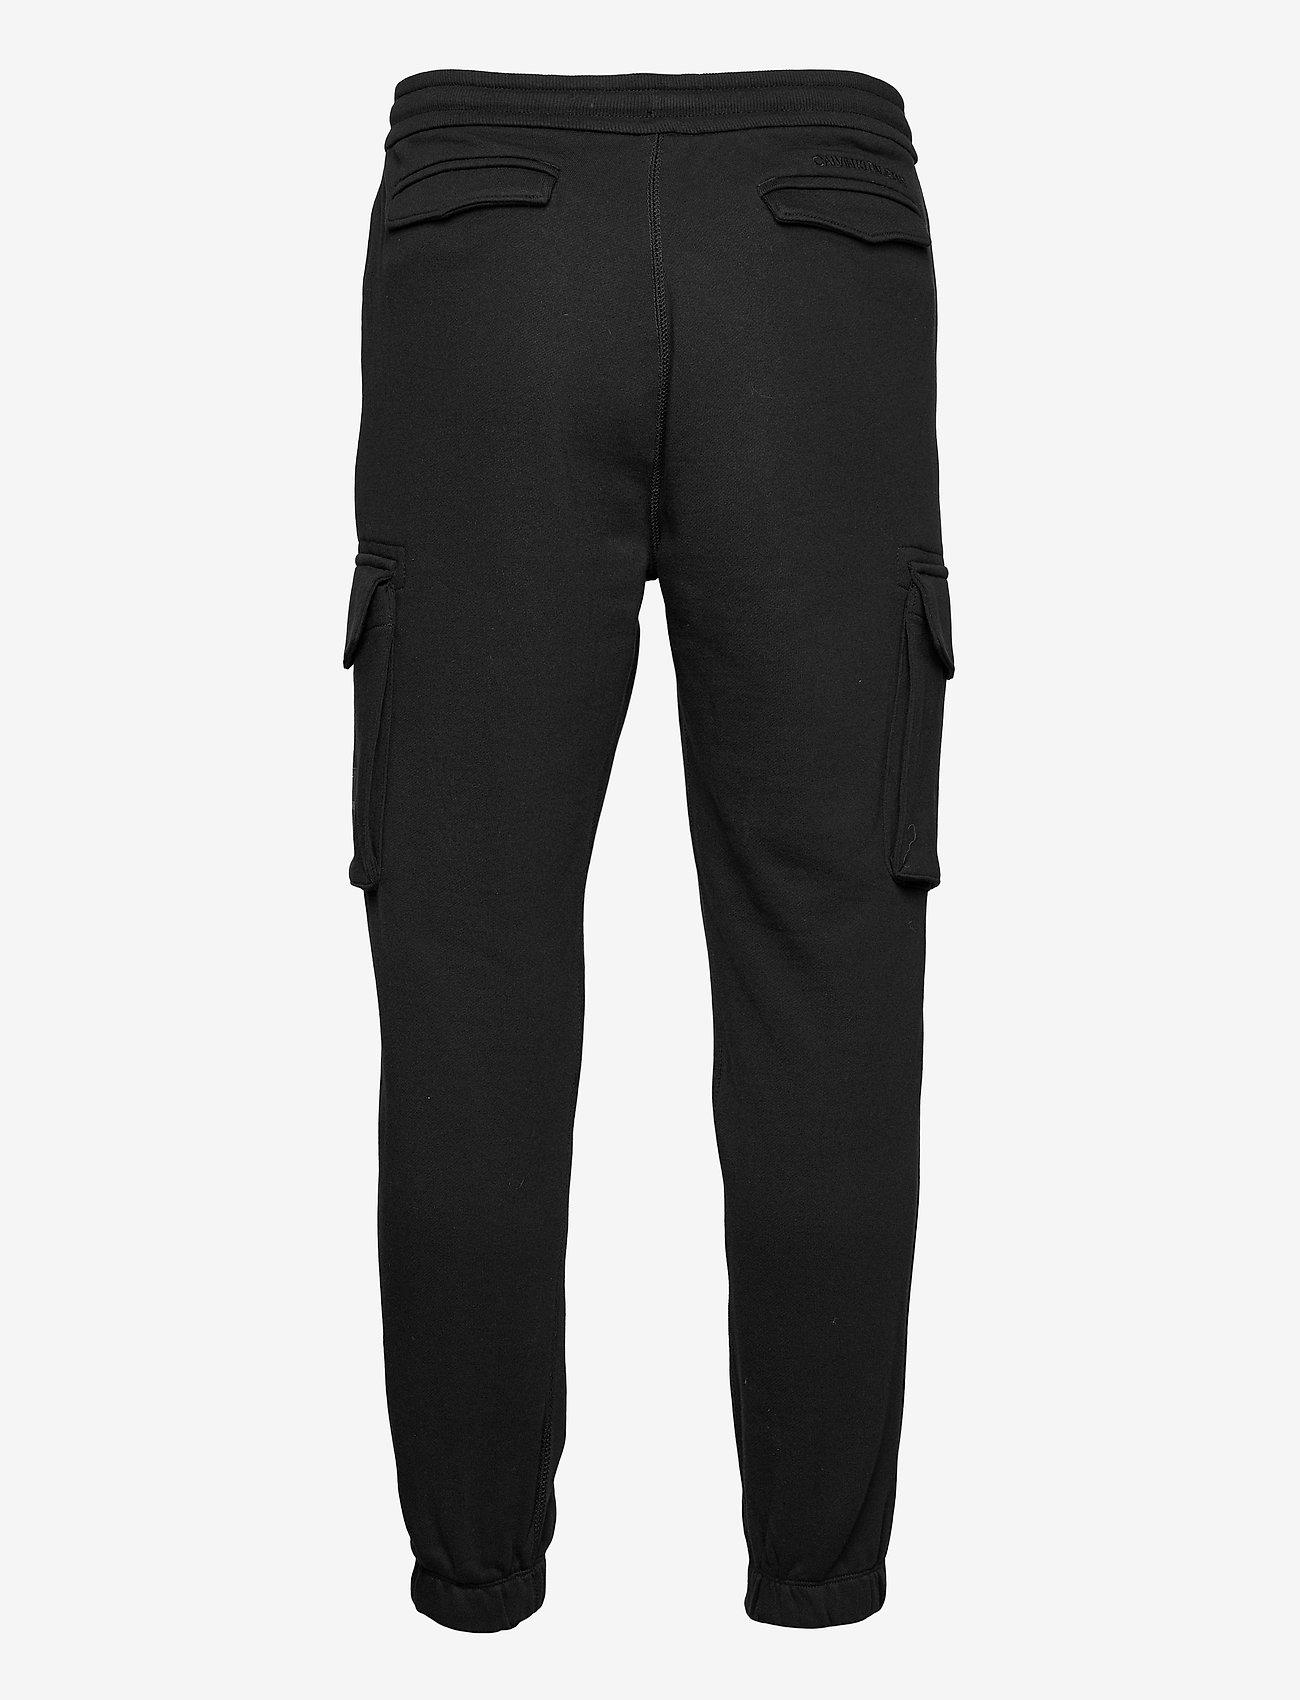 Calvin Klein Jeans - CARGO BADGE FLEECE PANT - cargobroek - ck black - 1